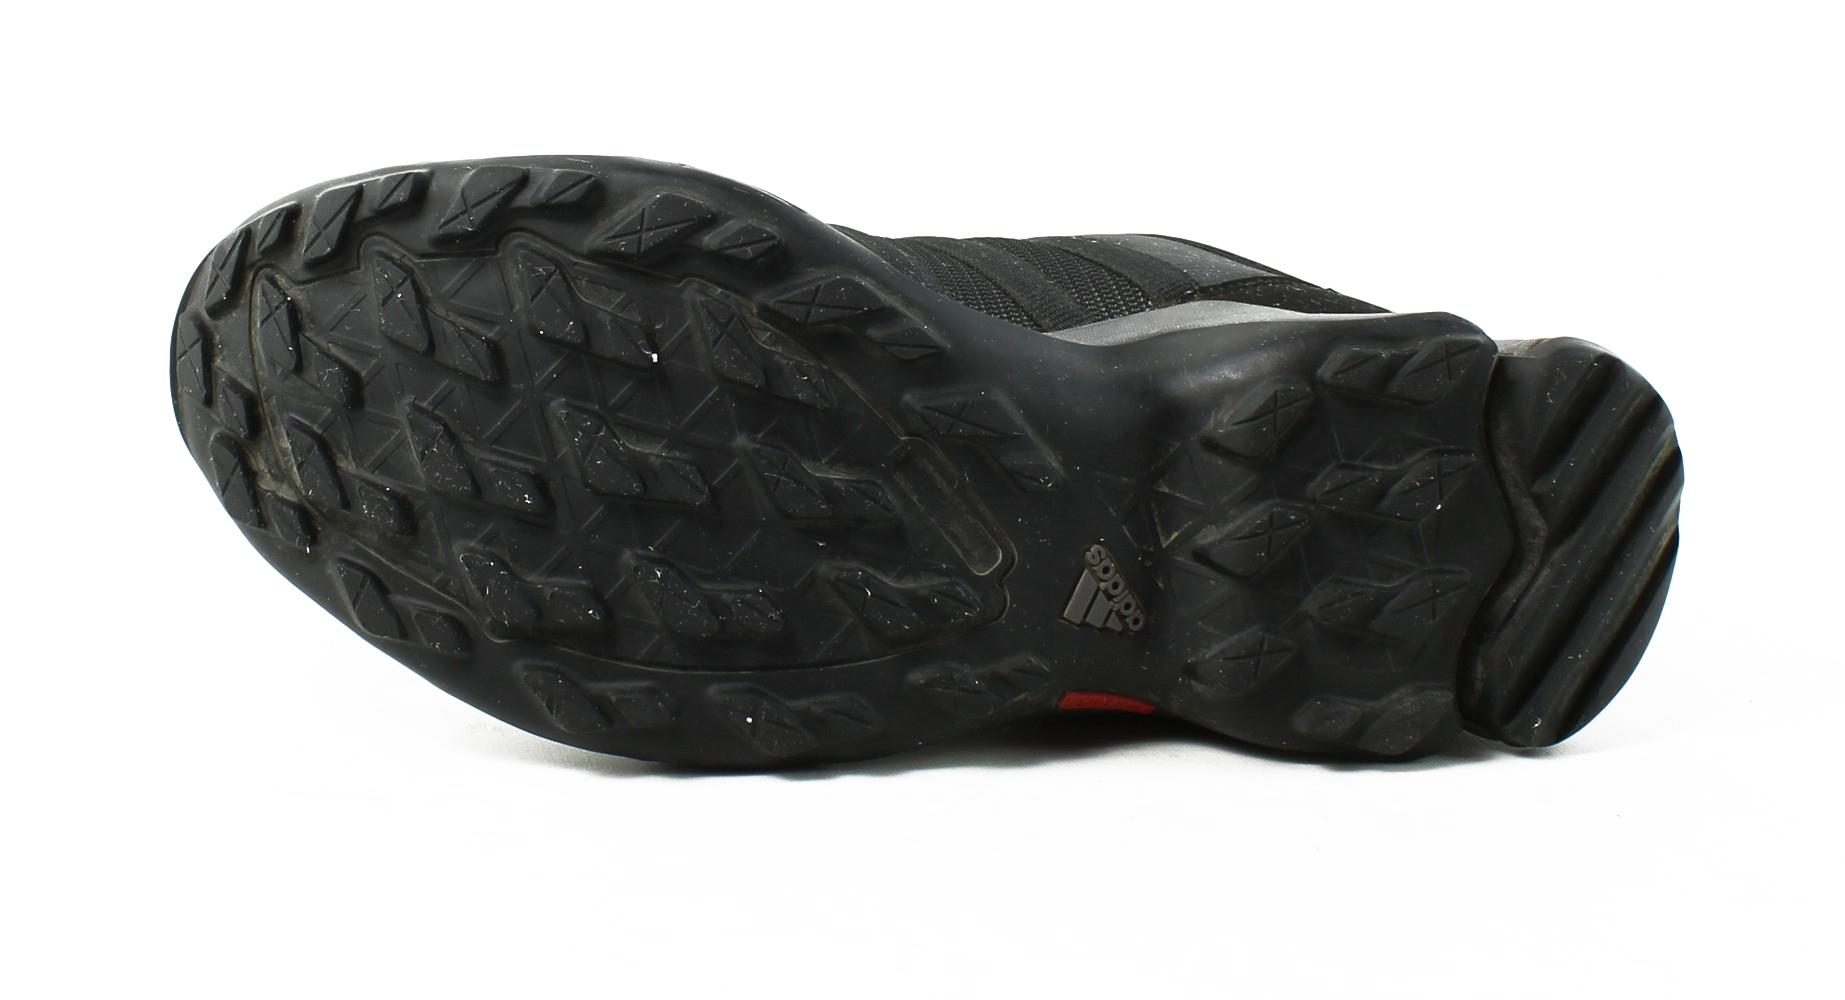 Adidas / - mens - utilityschwarz / Adidas schwarz / lightscarlet trail / wanderschuhe größe 9,5 444ad7